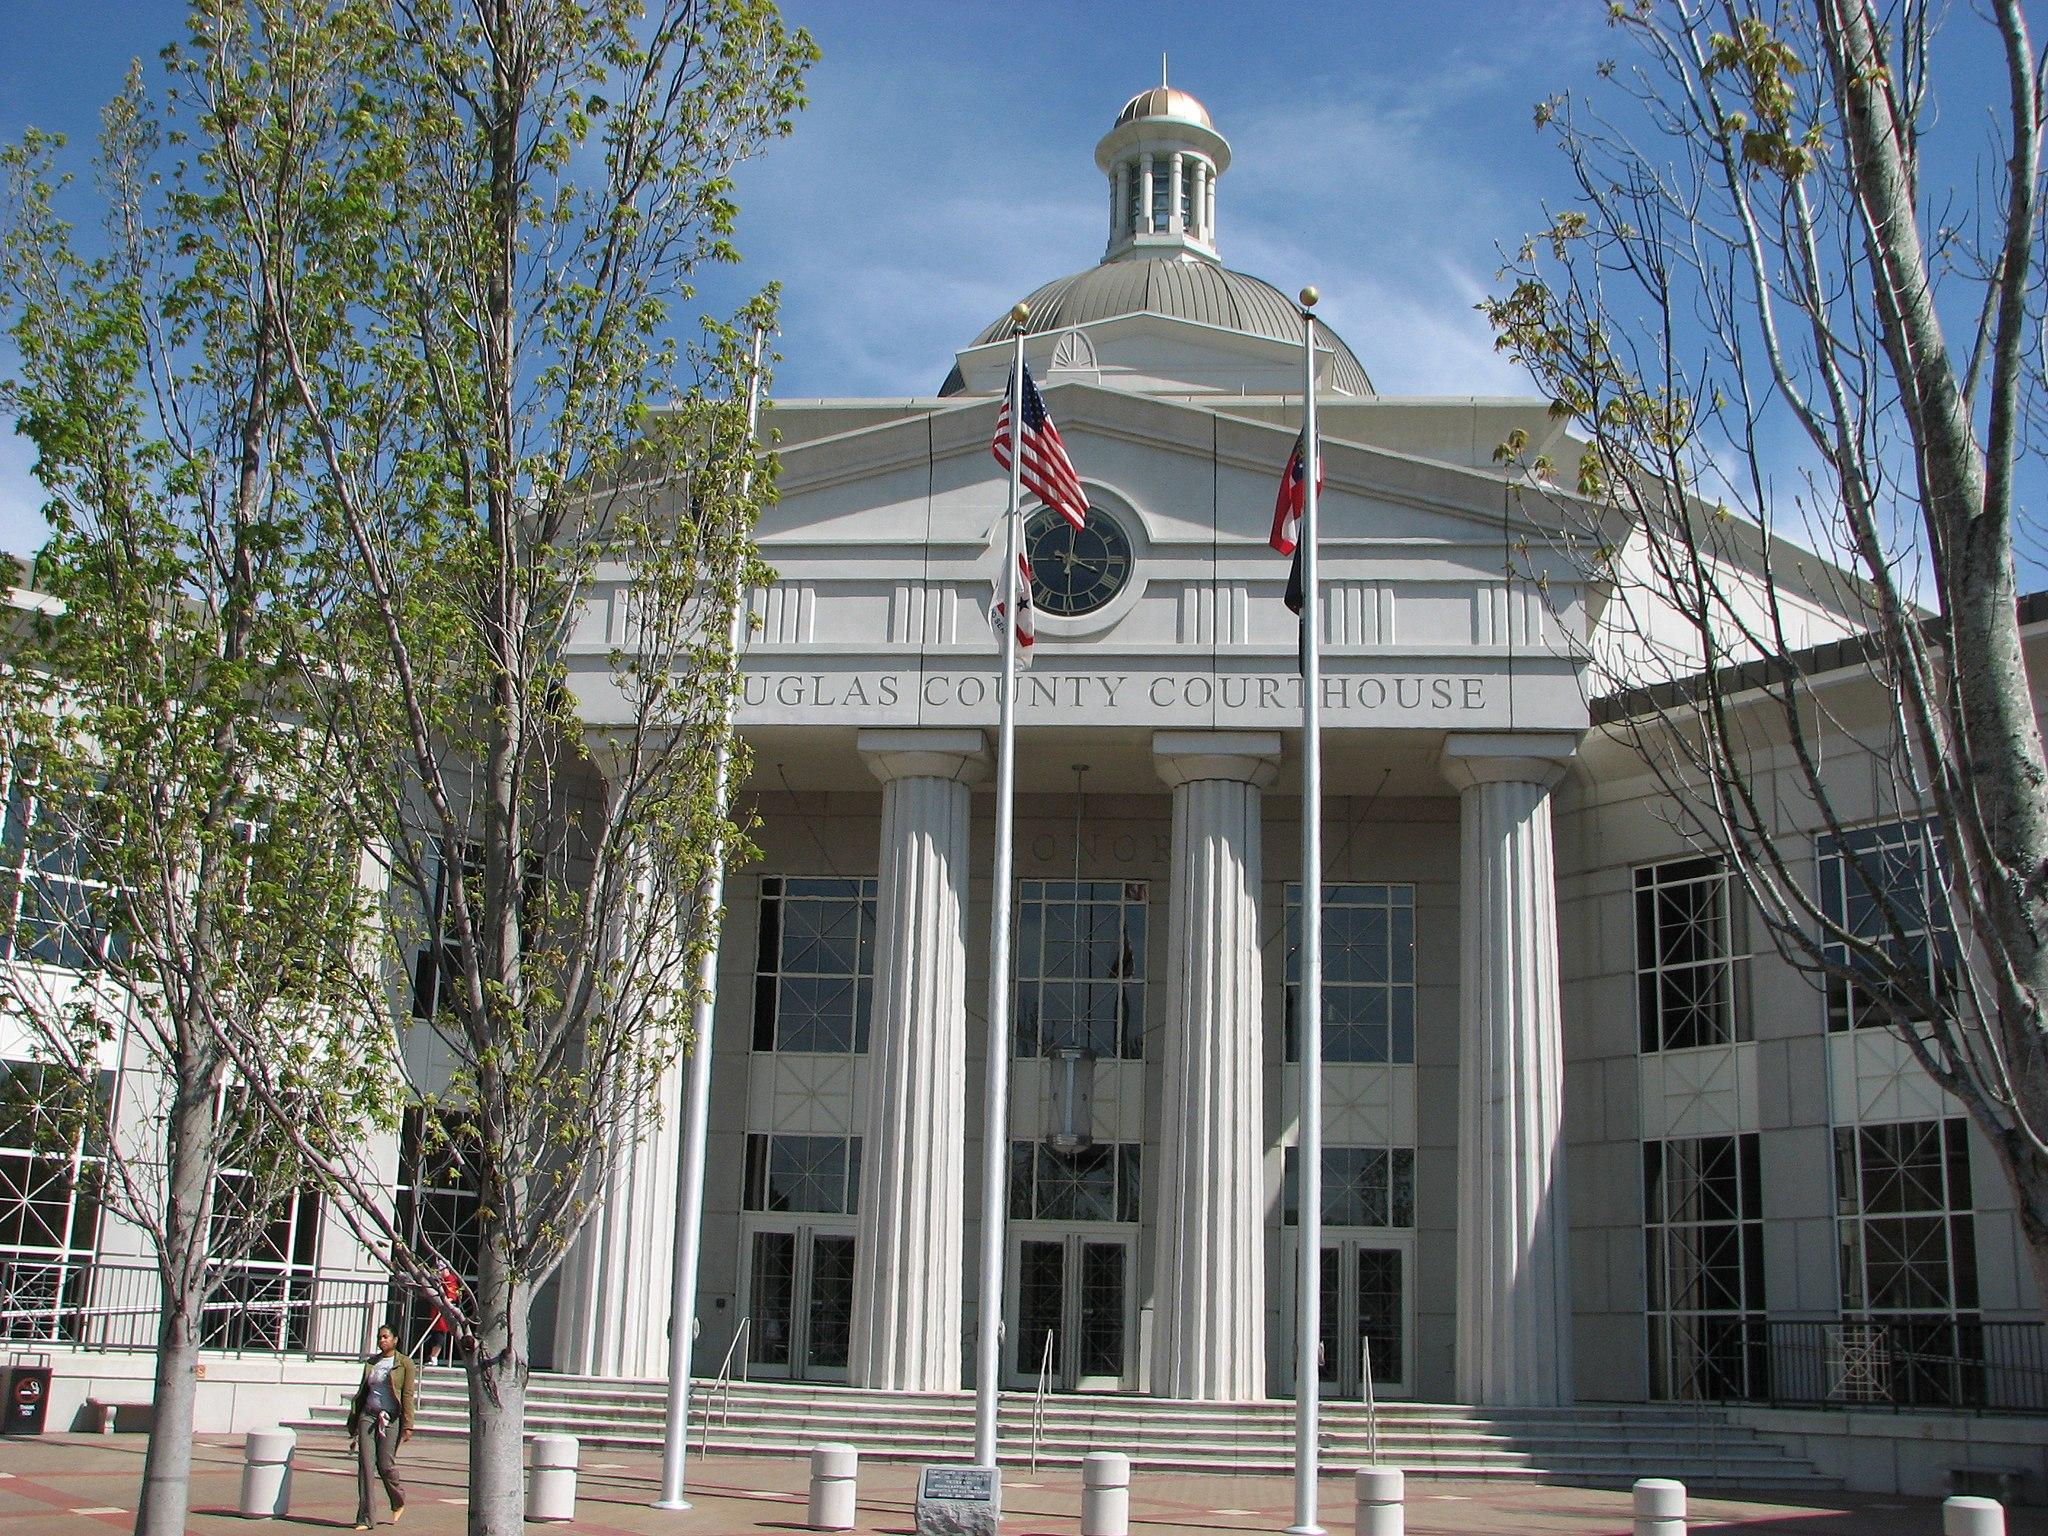 USA-Georgia-Douglasville County Courthouse